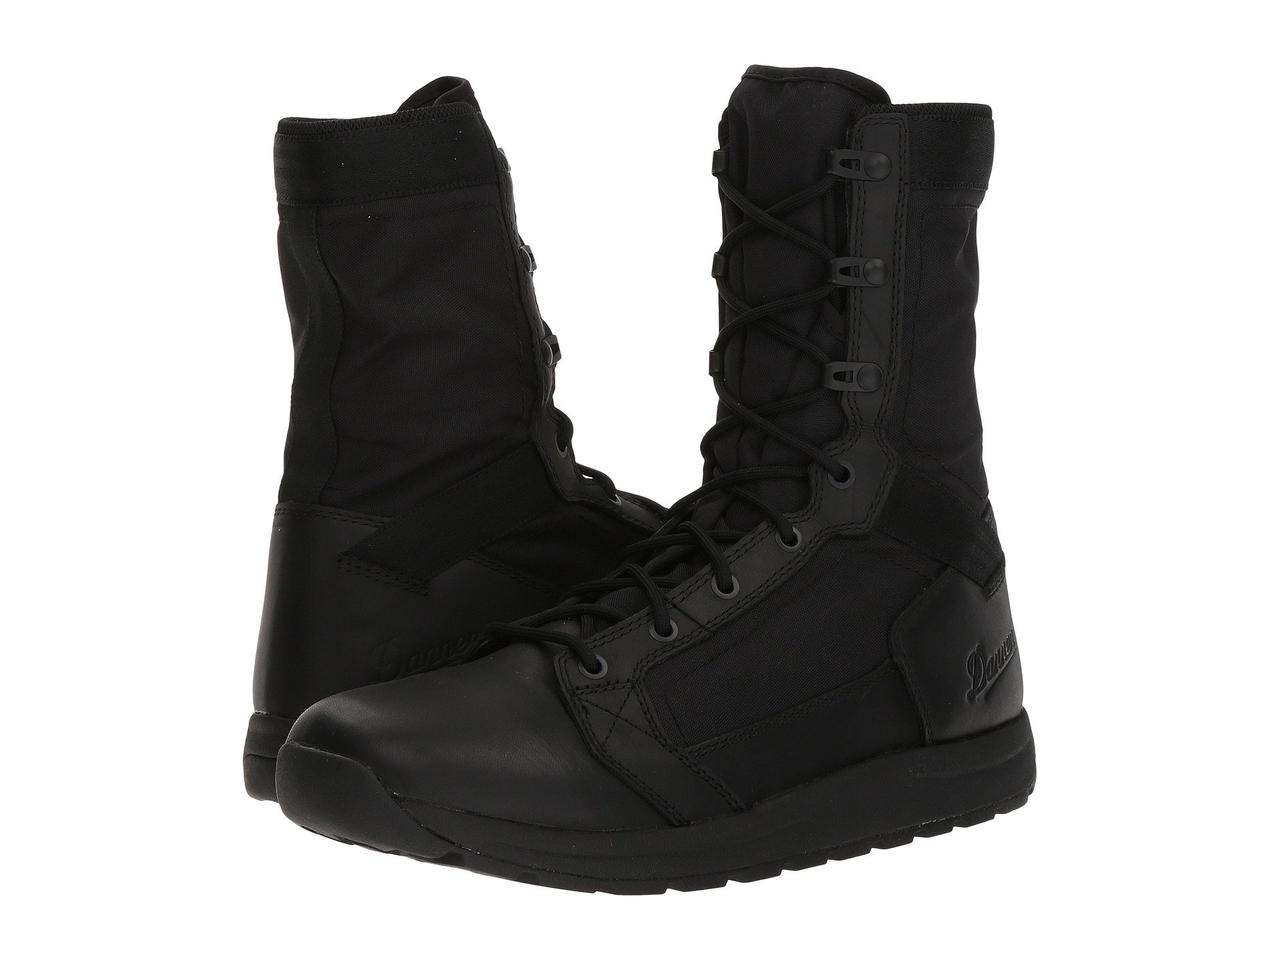 "Ботинки/Сапоги (Оригинал) Danner Tachyon 8"" Polishable Black"